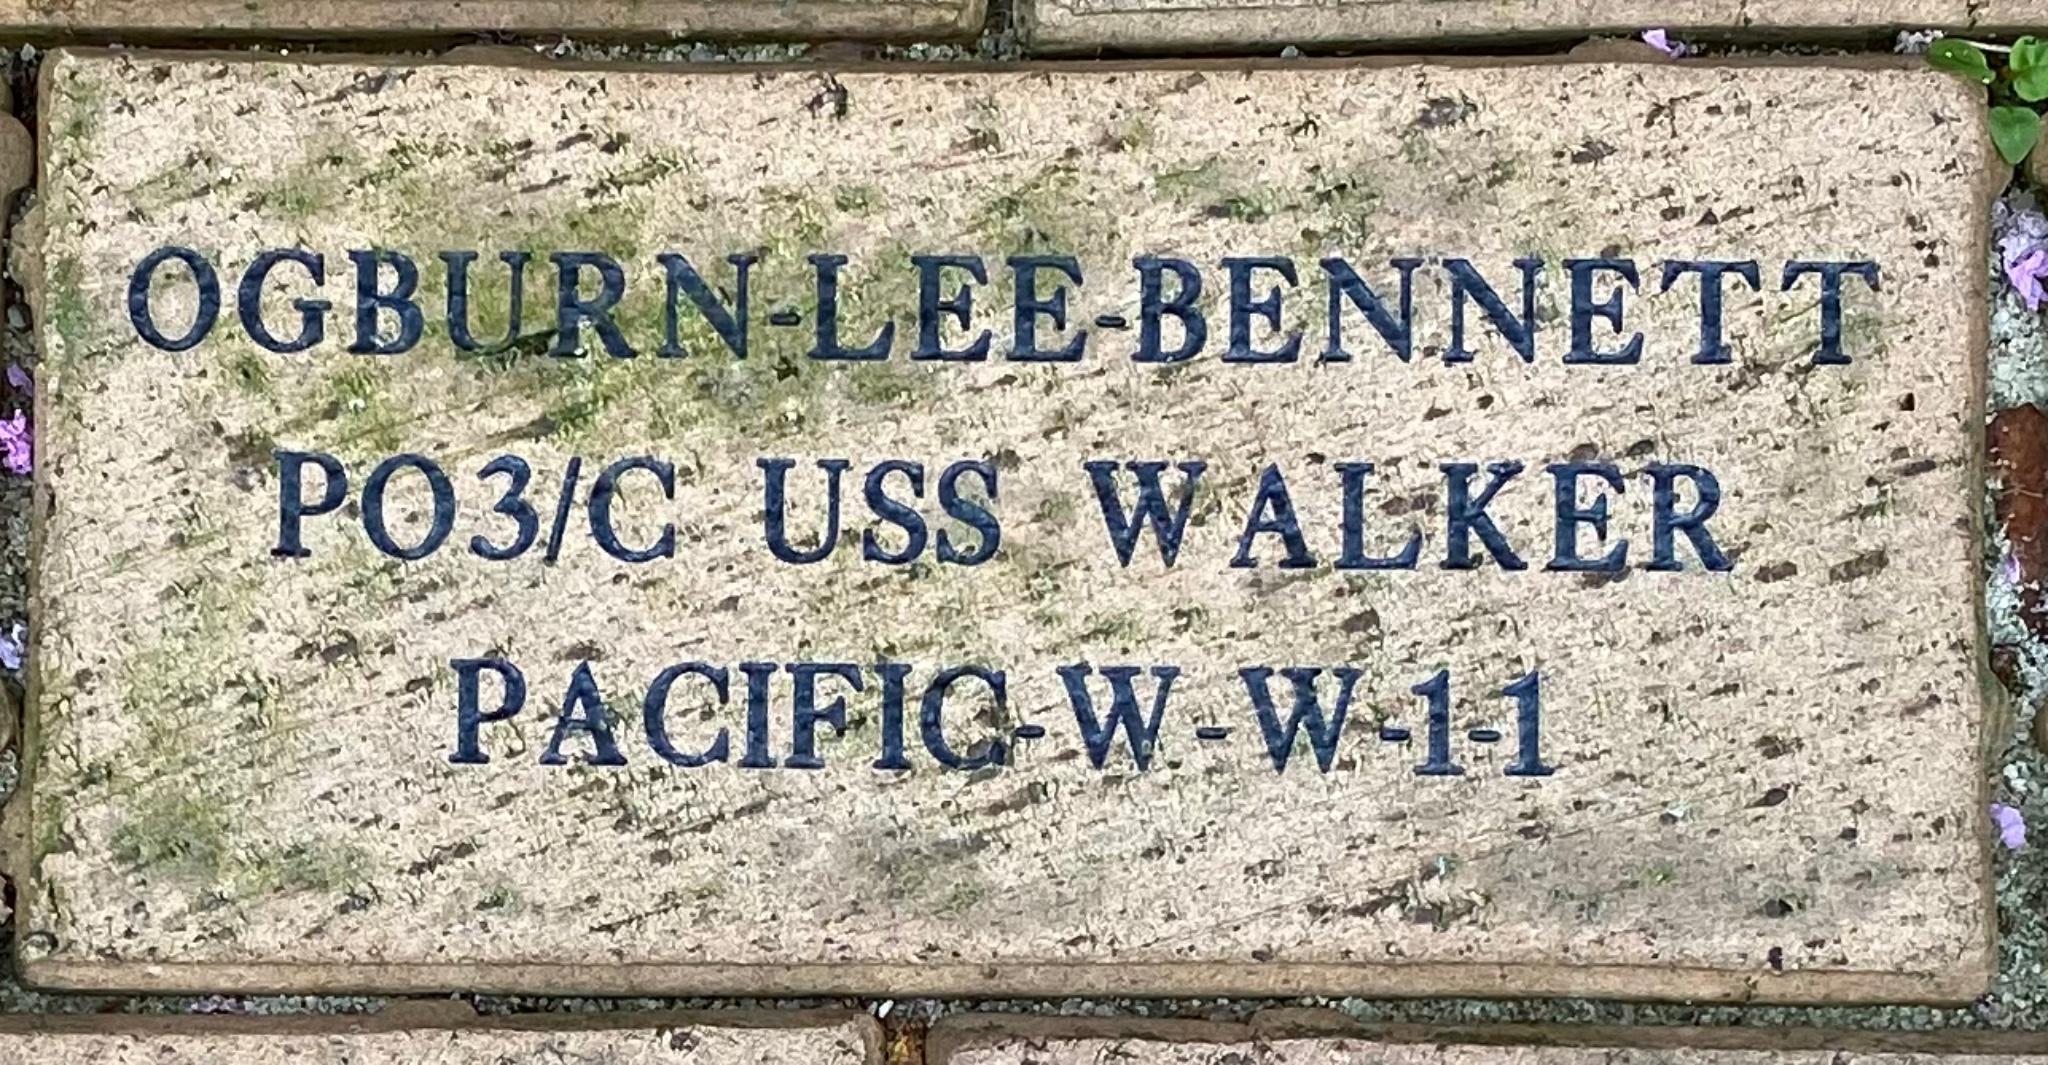 OGBURN-LEE-BENNETT PO3/C USS WALKER PACIFIC-W-W-I-I